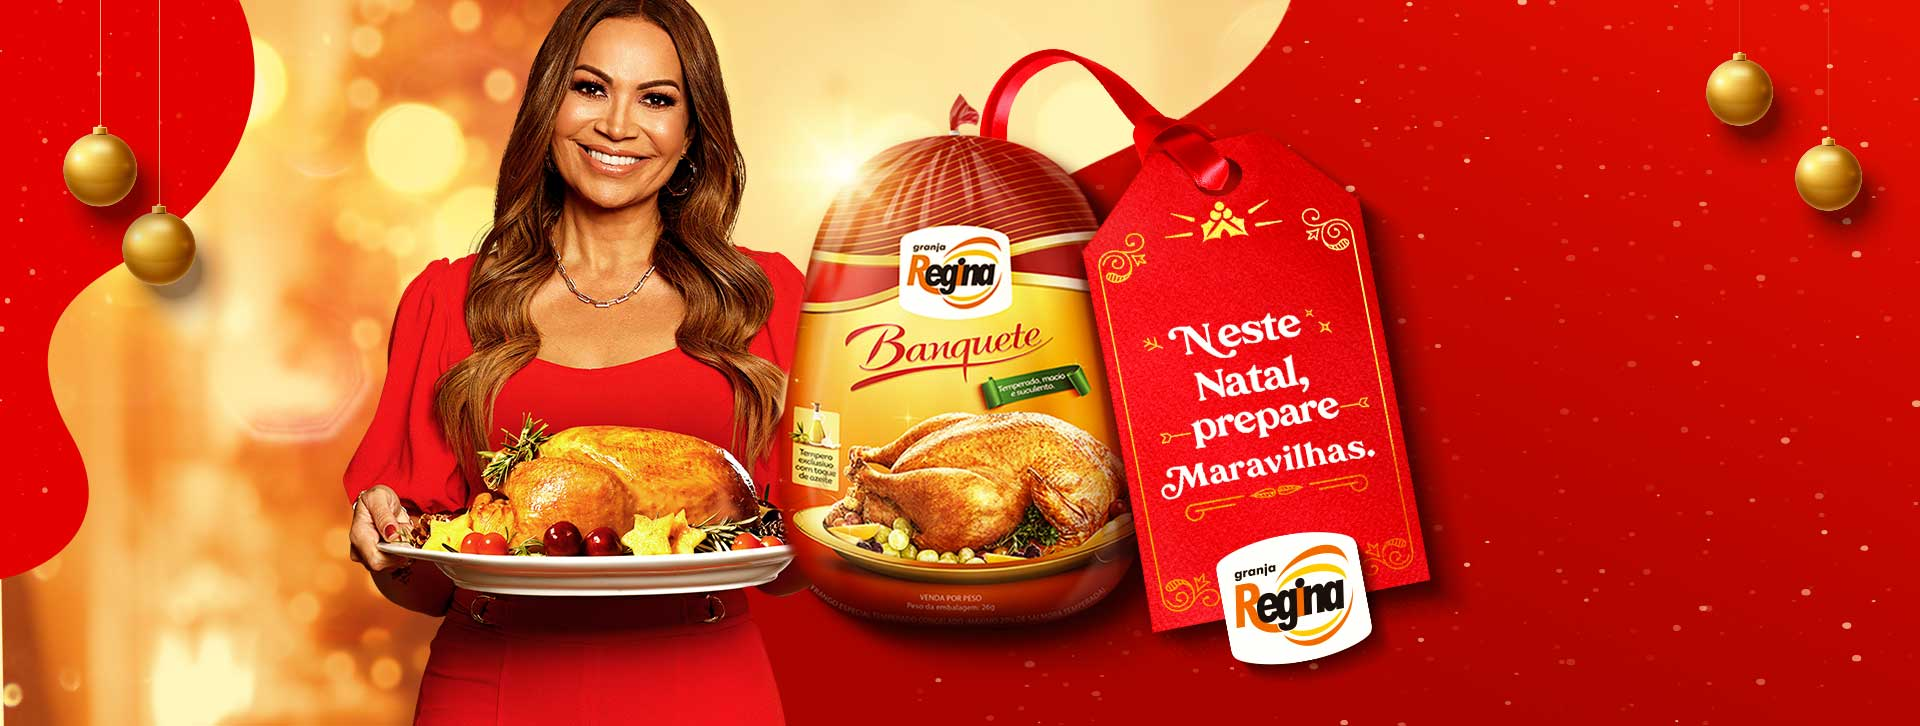 Banquete Granja Regina